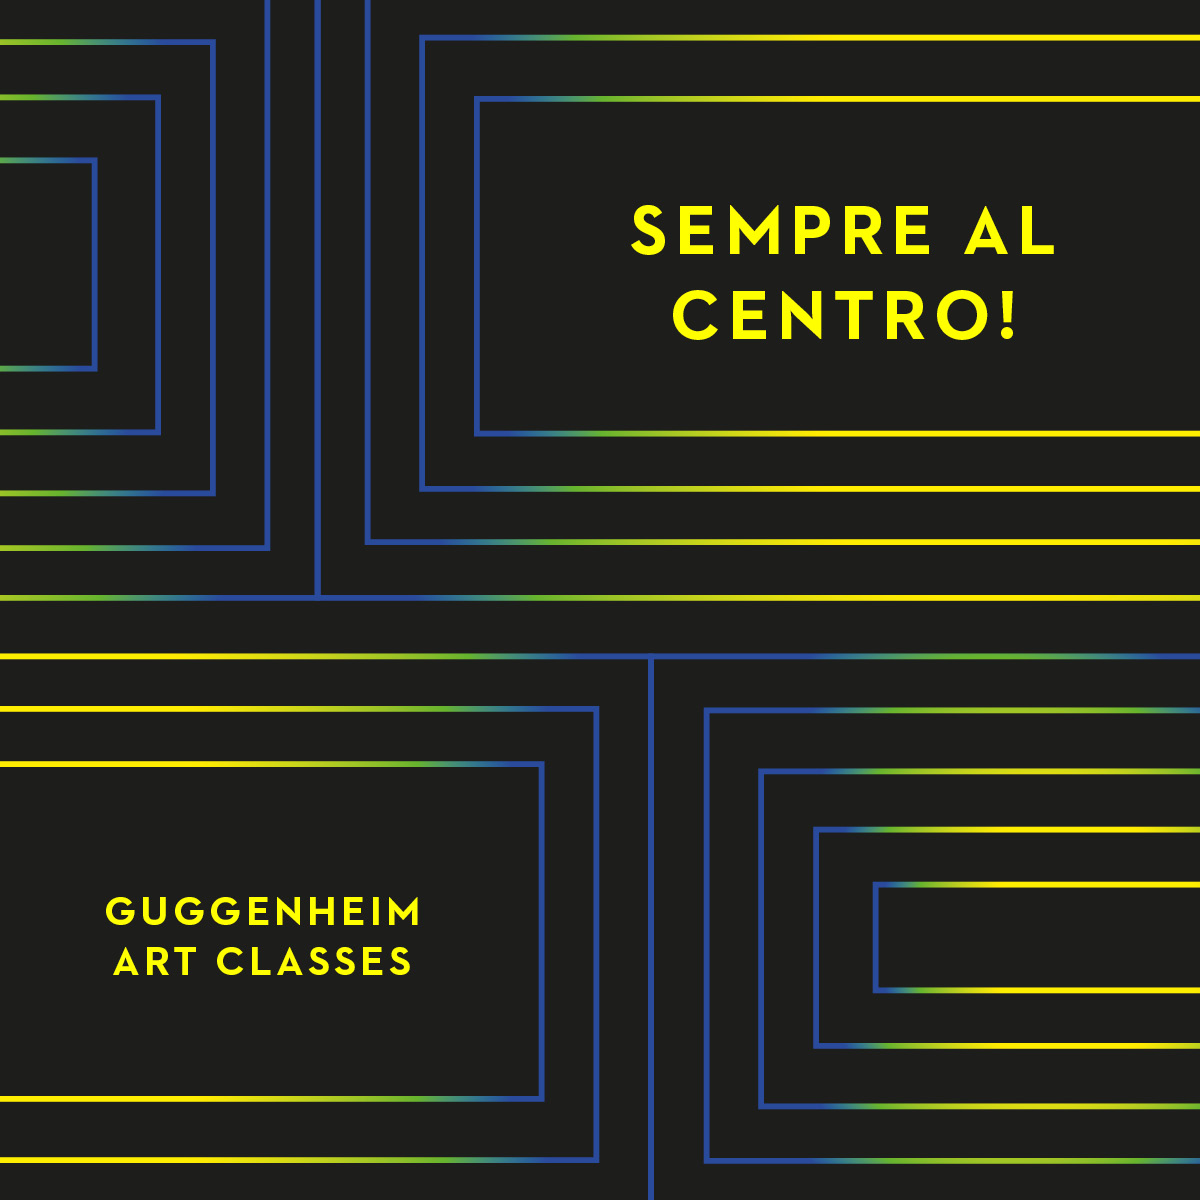 Guggenheim-Art-ClassesSempre-al-centro-001